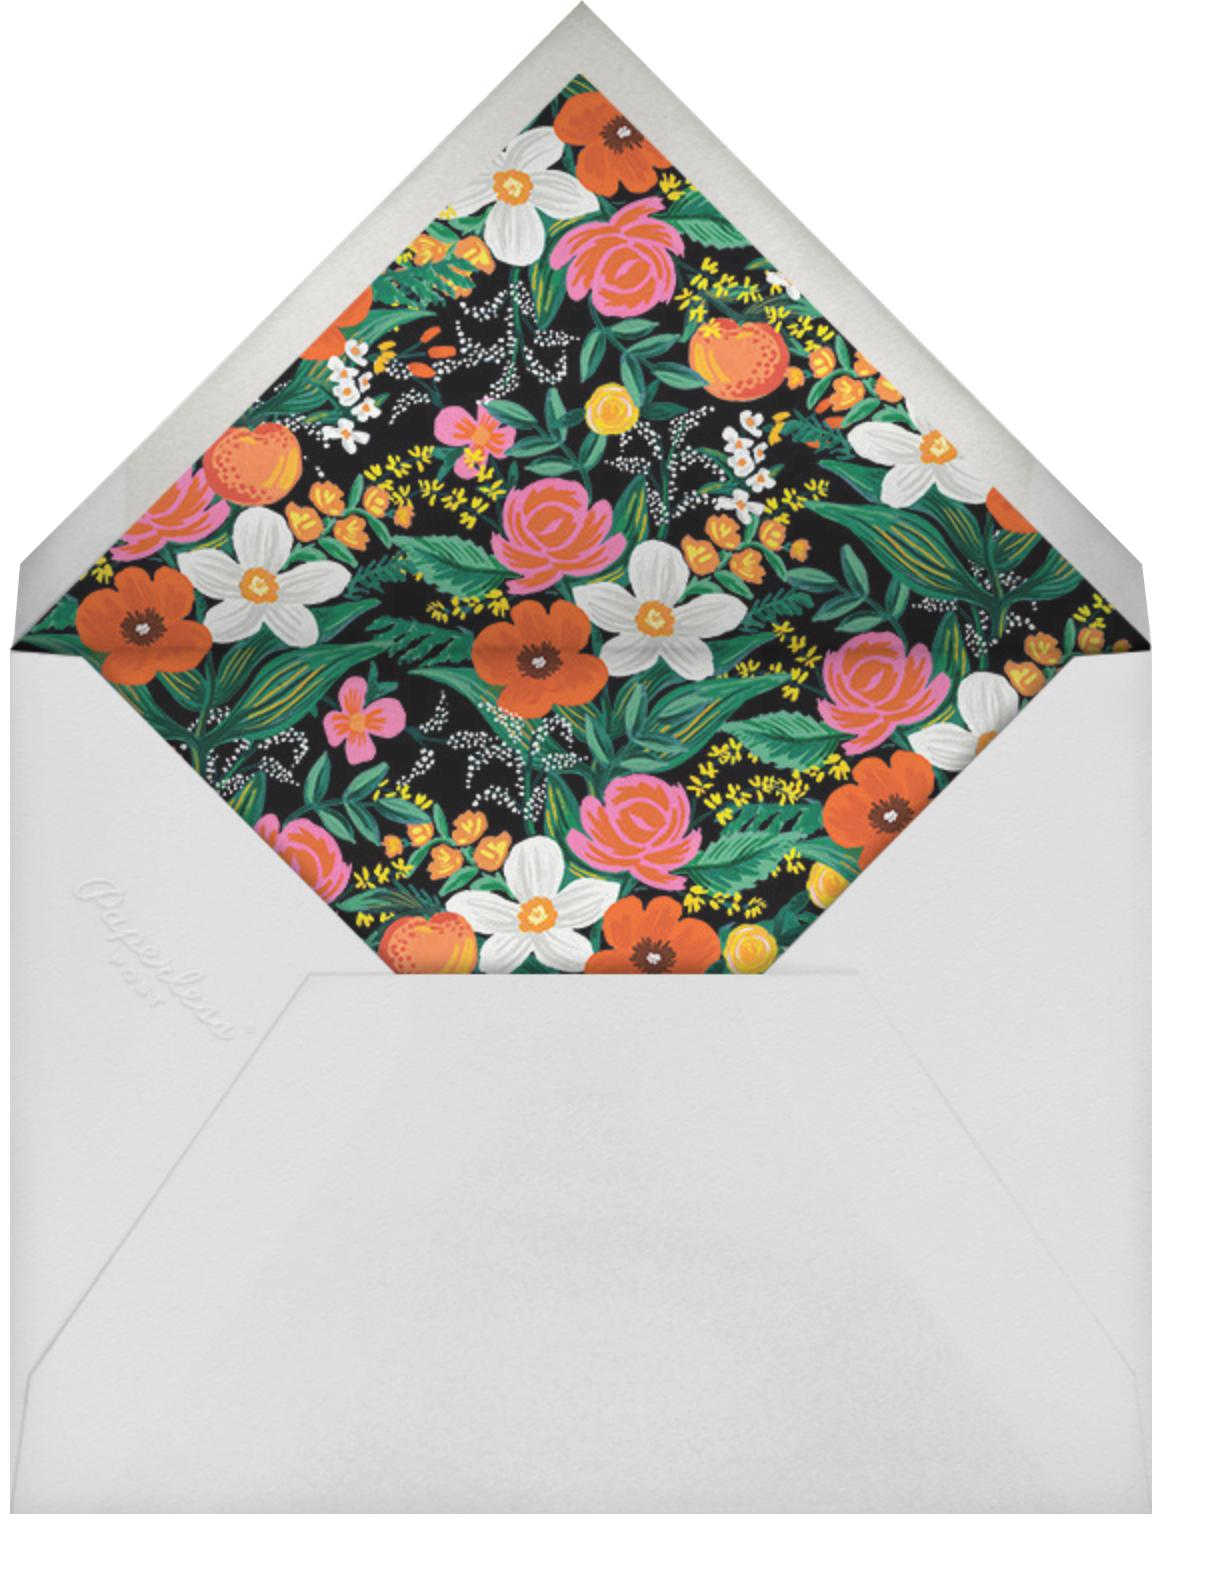 Orangerie (Save the Date) - Black - Rifle Paper Co. - Photo  - envelope back